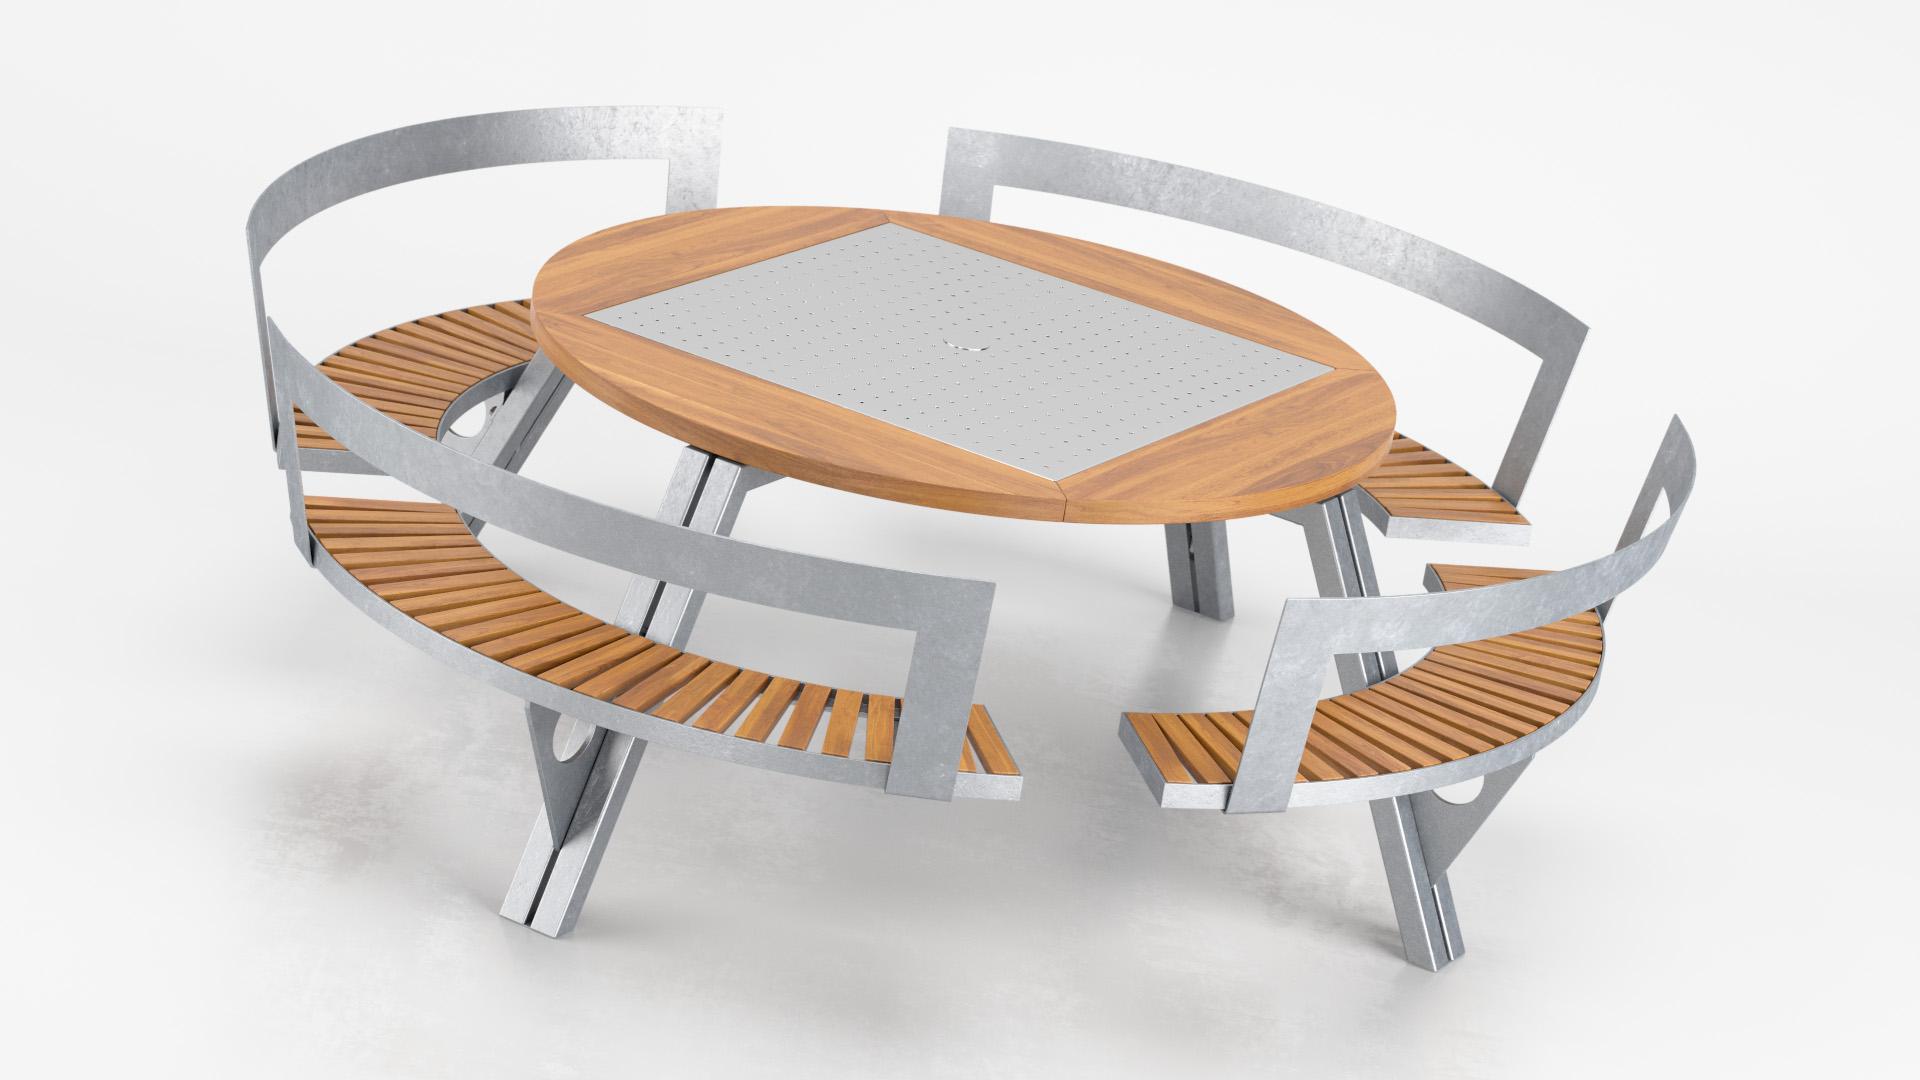 Gargantua_Table_Mode3_WhiteSet_01_0003